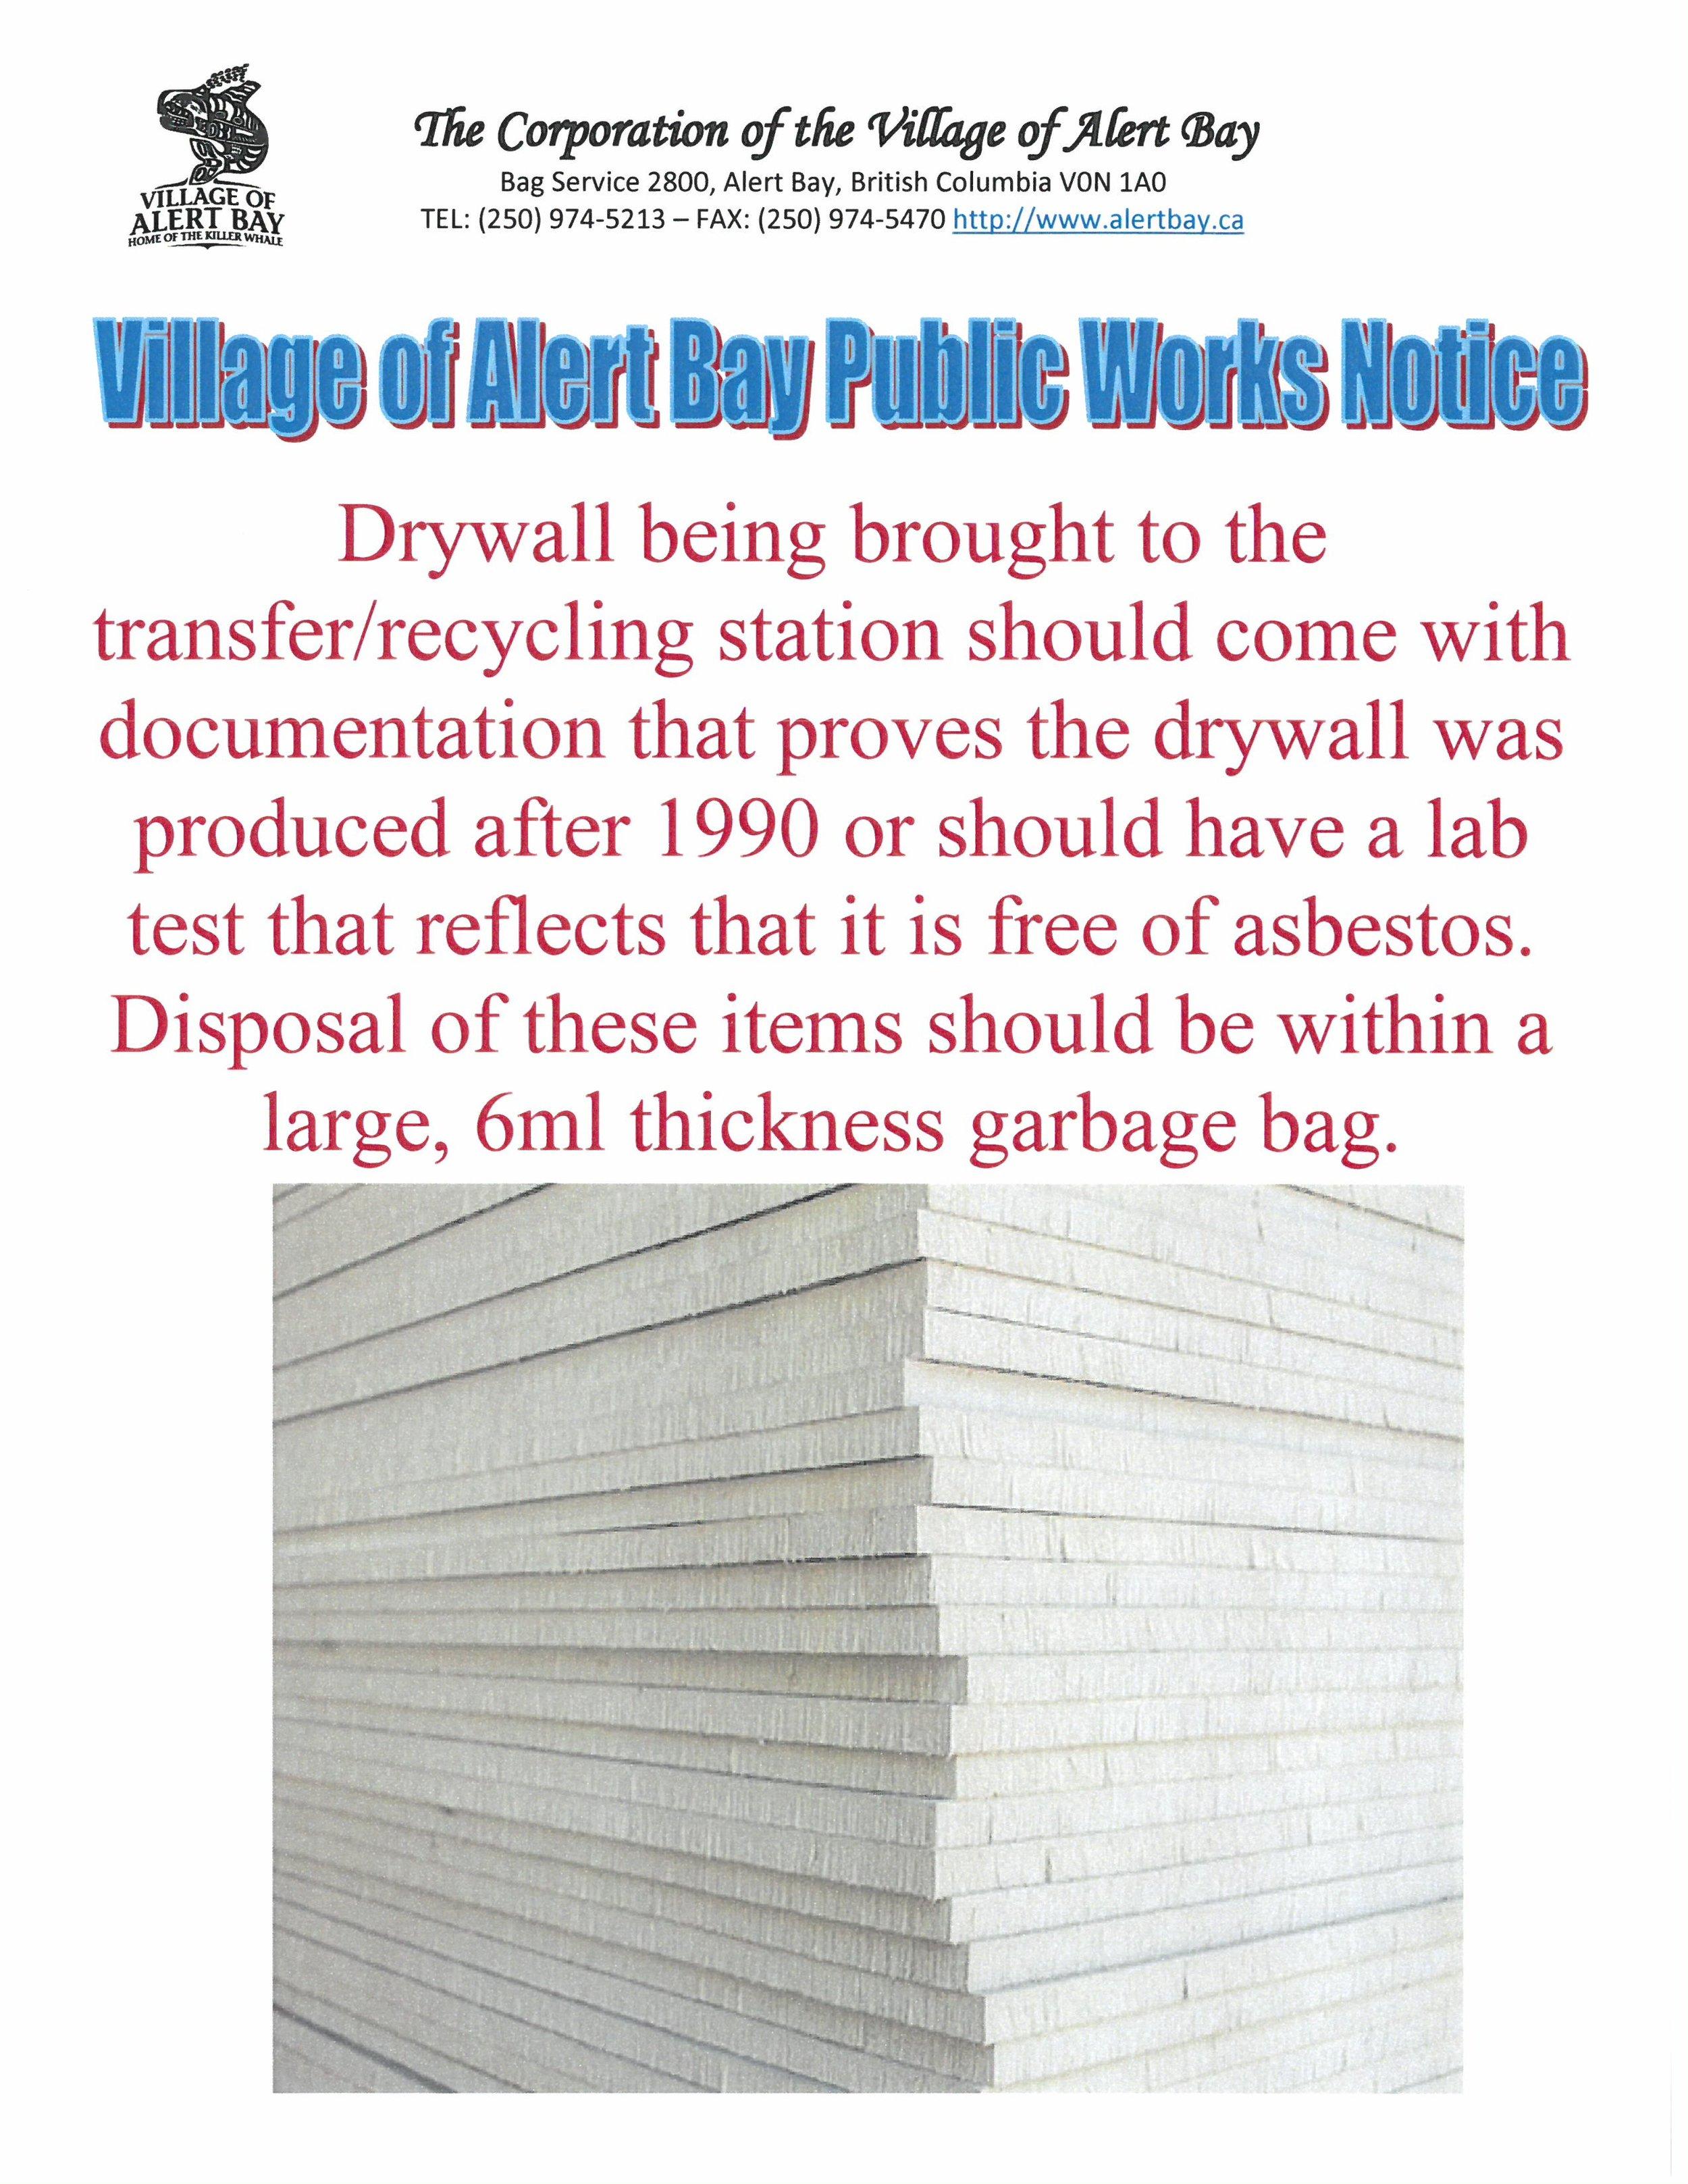 Public Works Poster February 11, 2019 Drywall.jpg